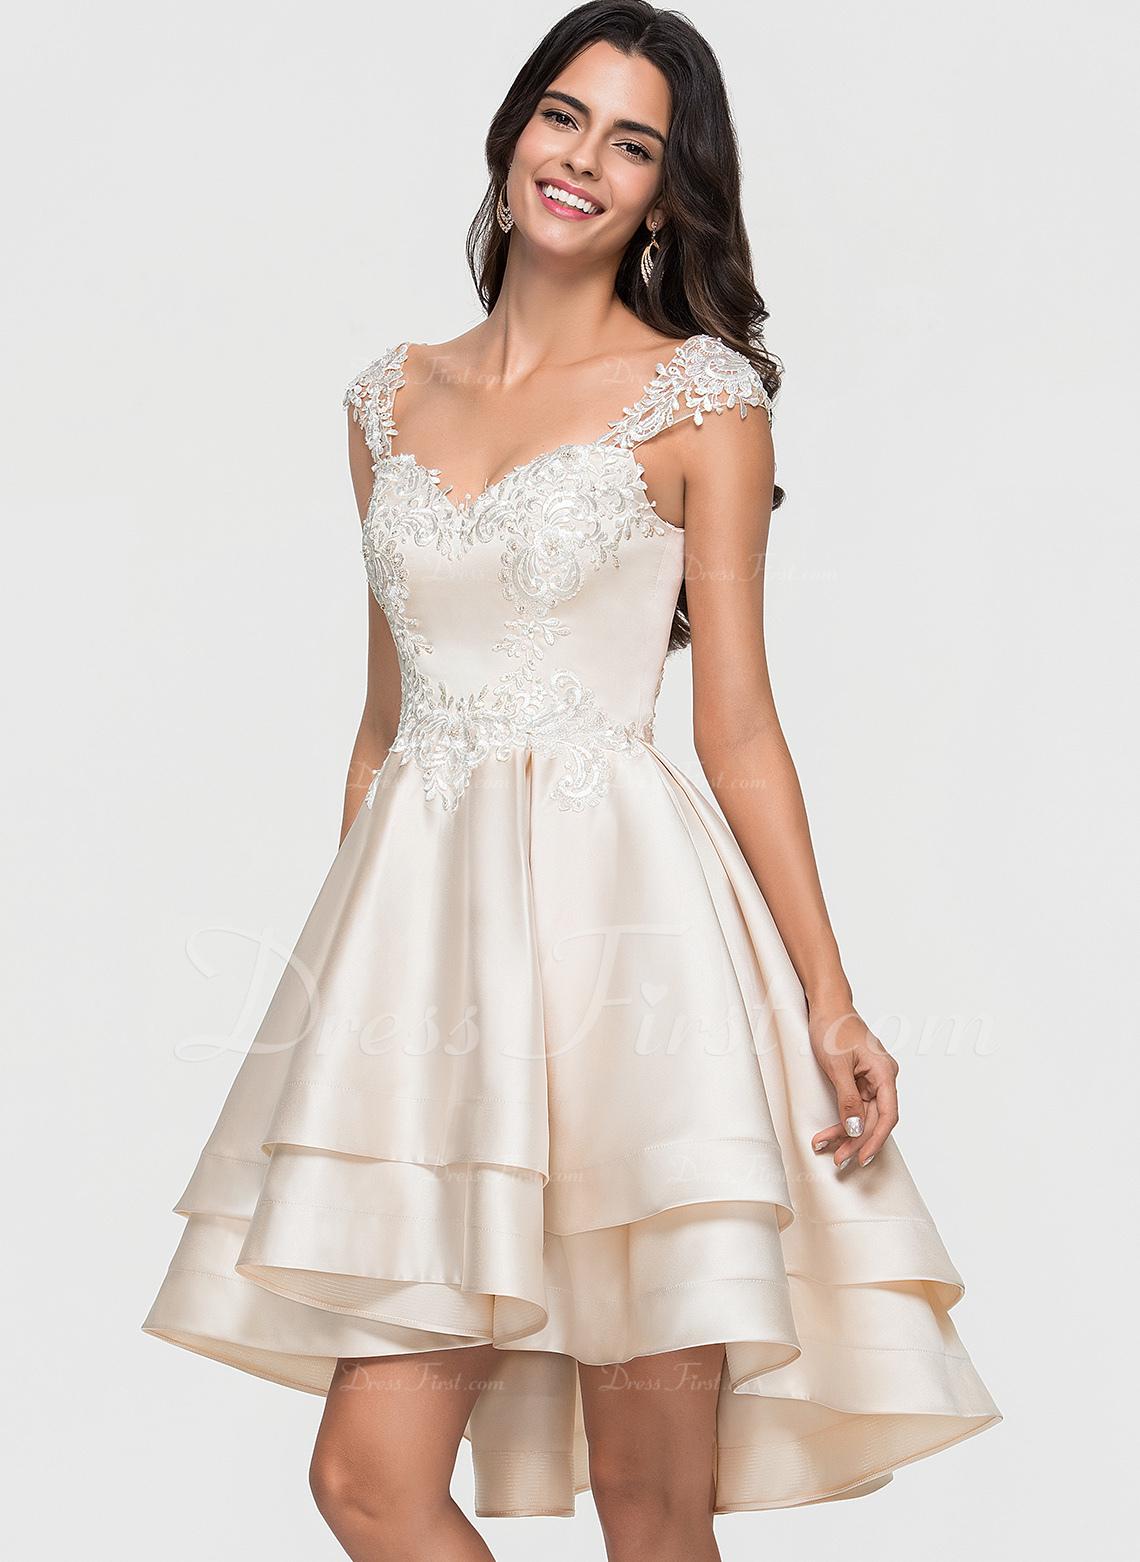 A-Line Sweetheart Asymmetrical Satin Homecoming Dress